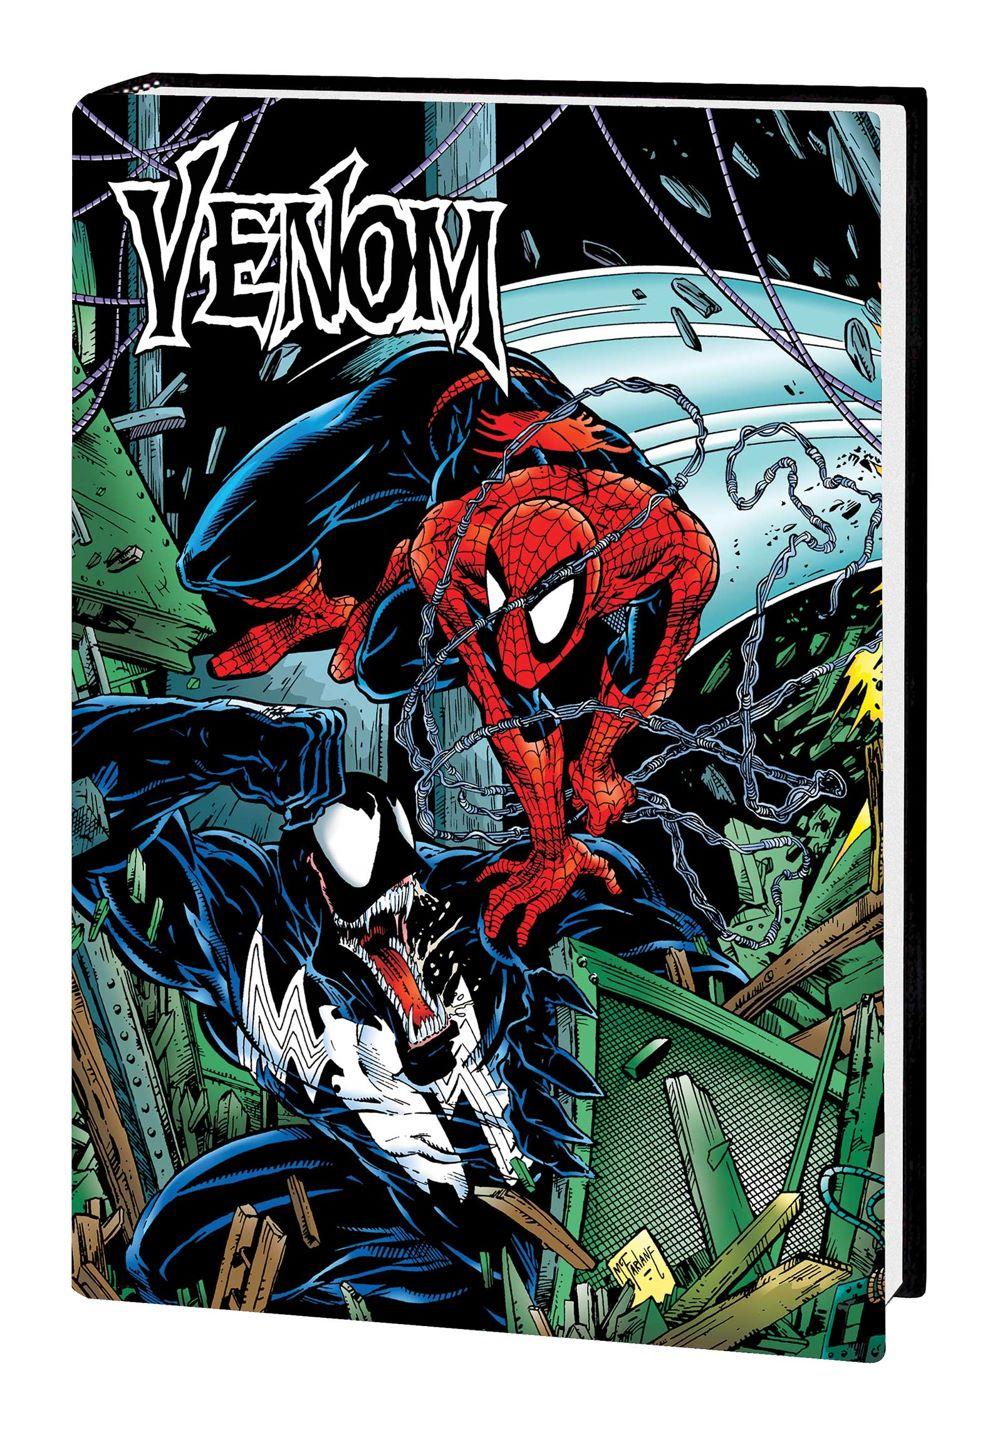 VENOM_GALLERY_HC Marvel Comics January 2021 Solicitations